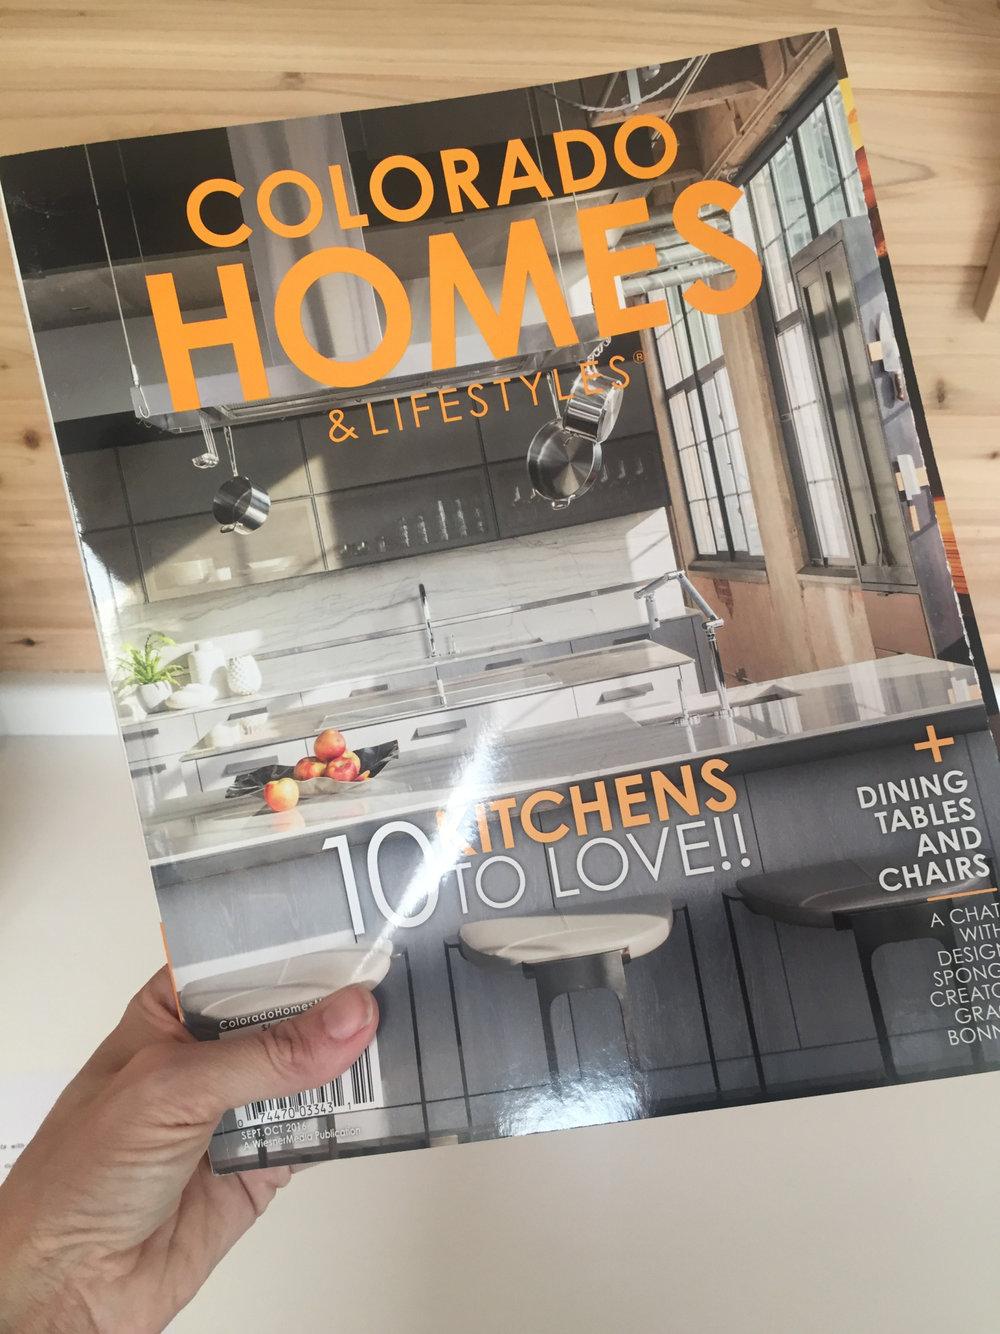 Colorado Homes & Lifestyles, Fall 2016 -